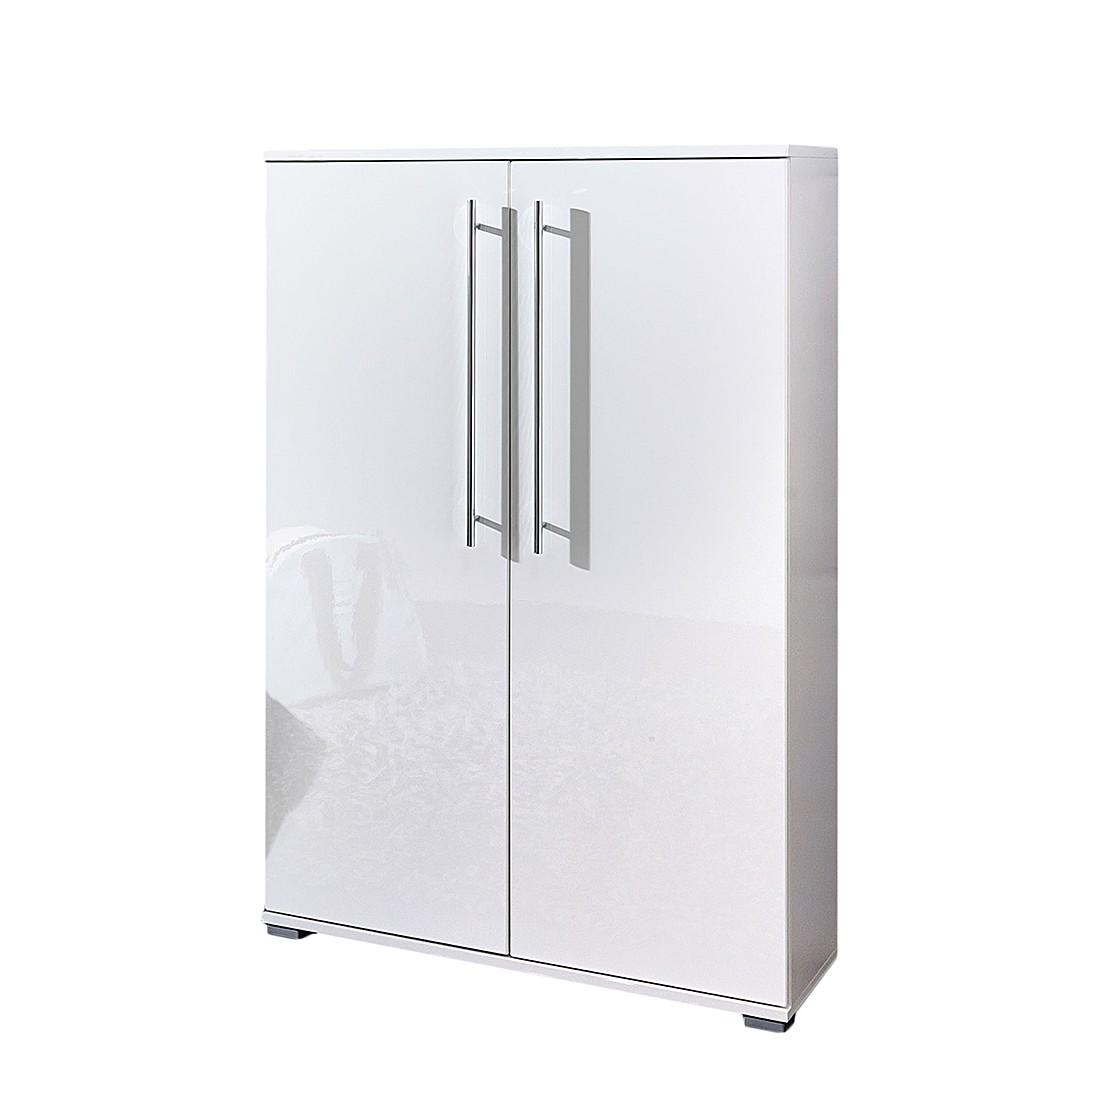 schuhschrank linear hochglanz wei top square g nstig. Black Bedroom Furniture Sets. Home Design Ideas